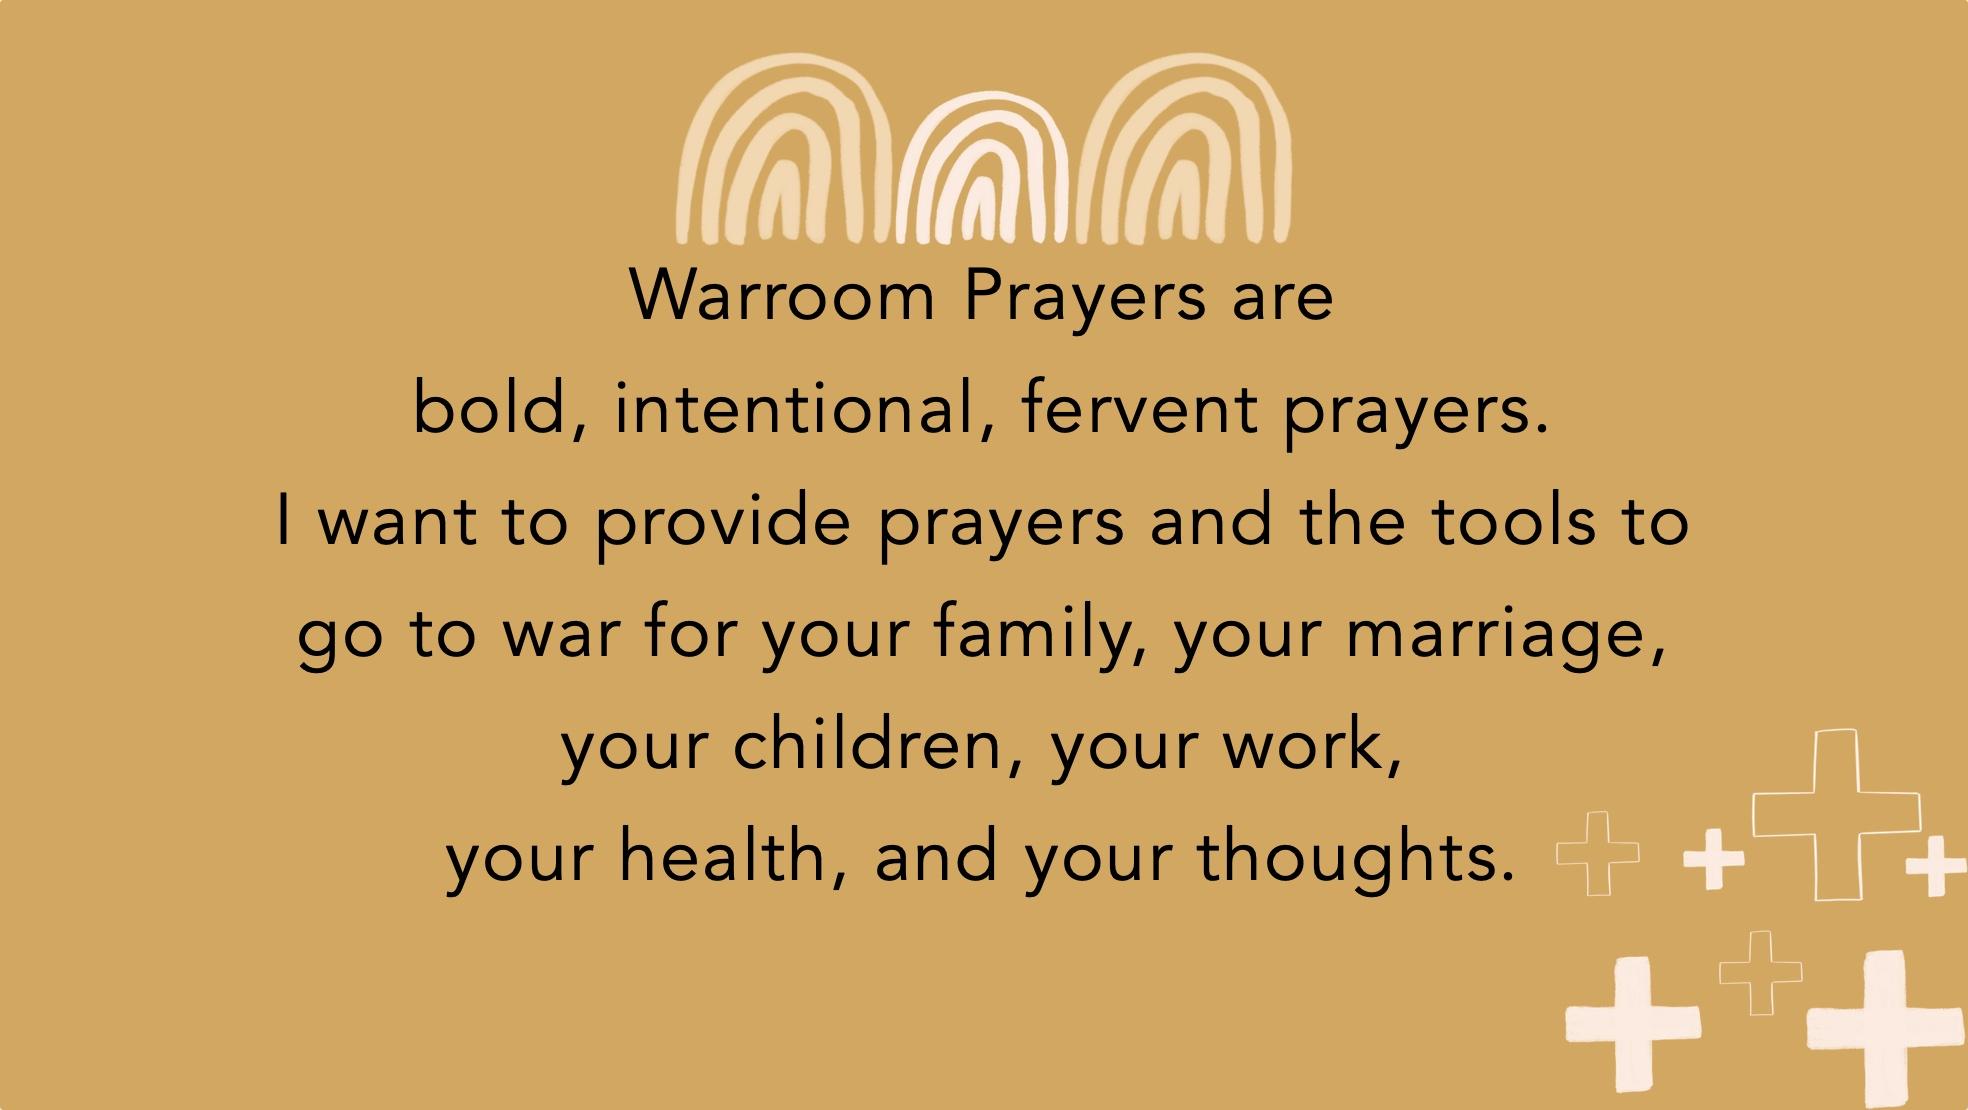 warrroom prayers pic.jpg